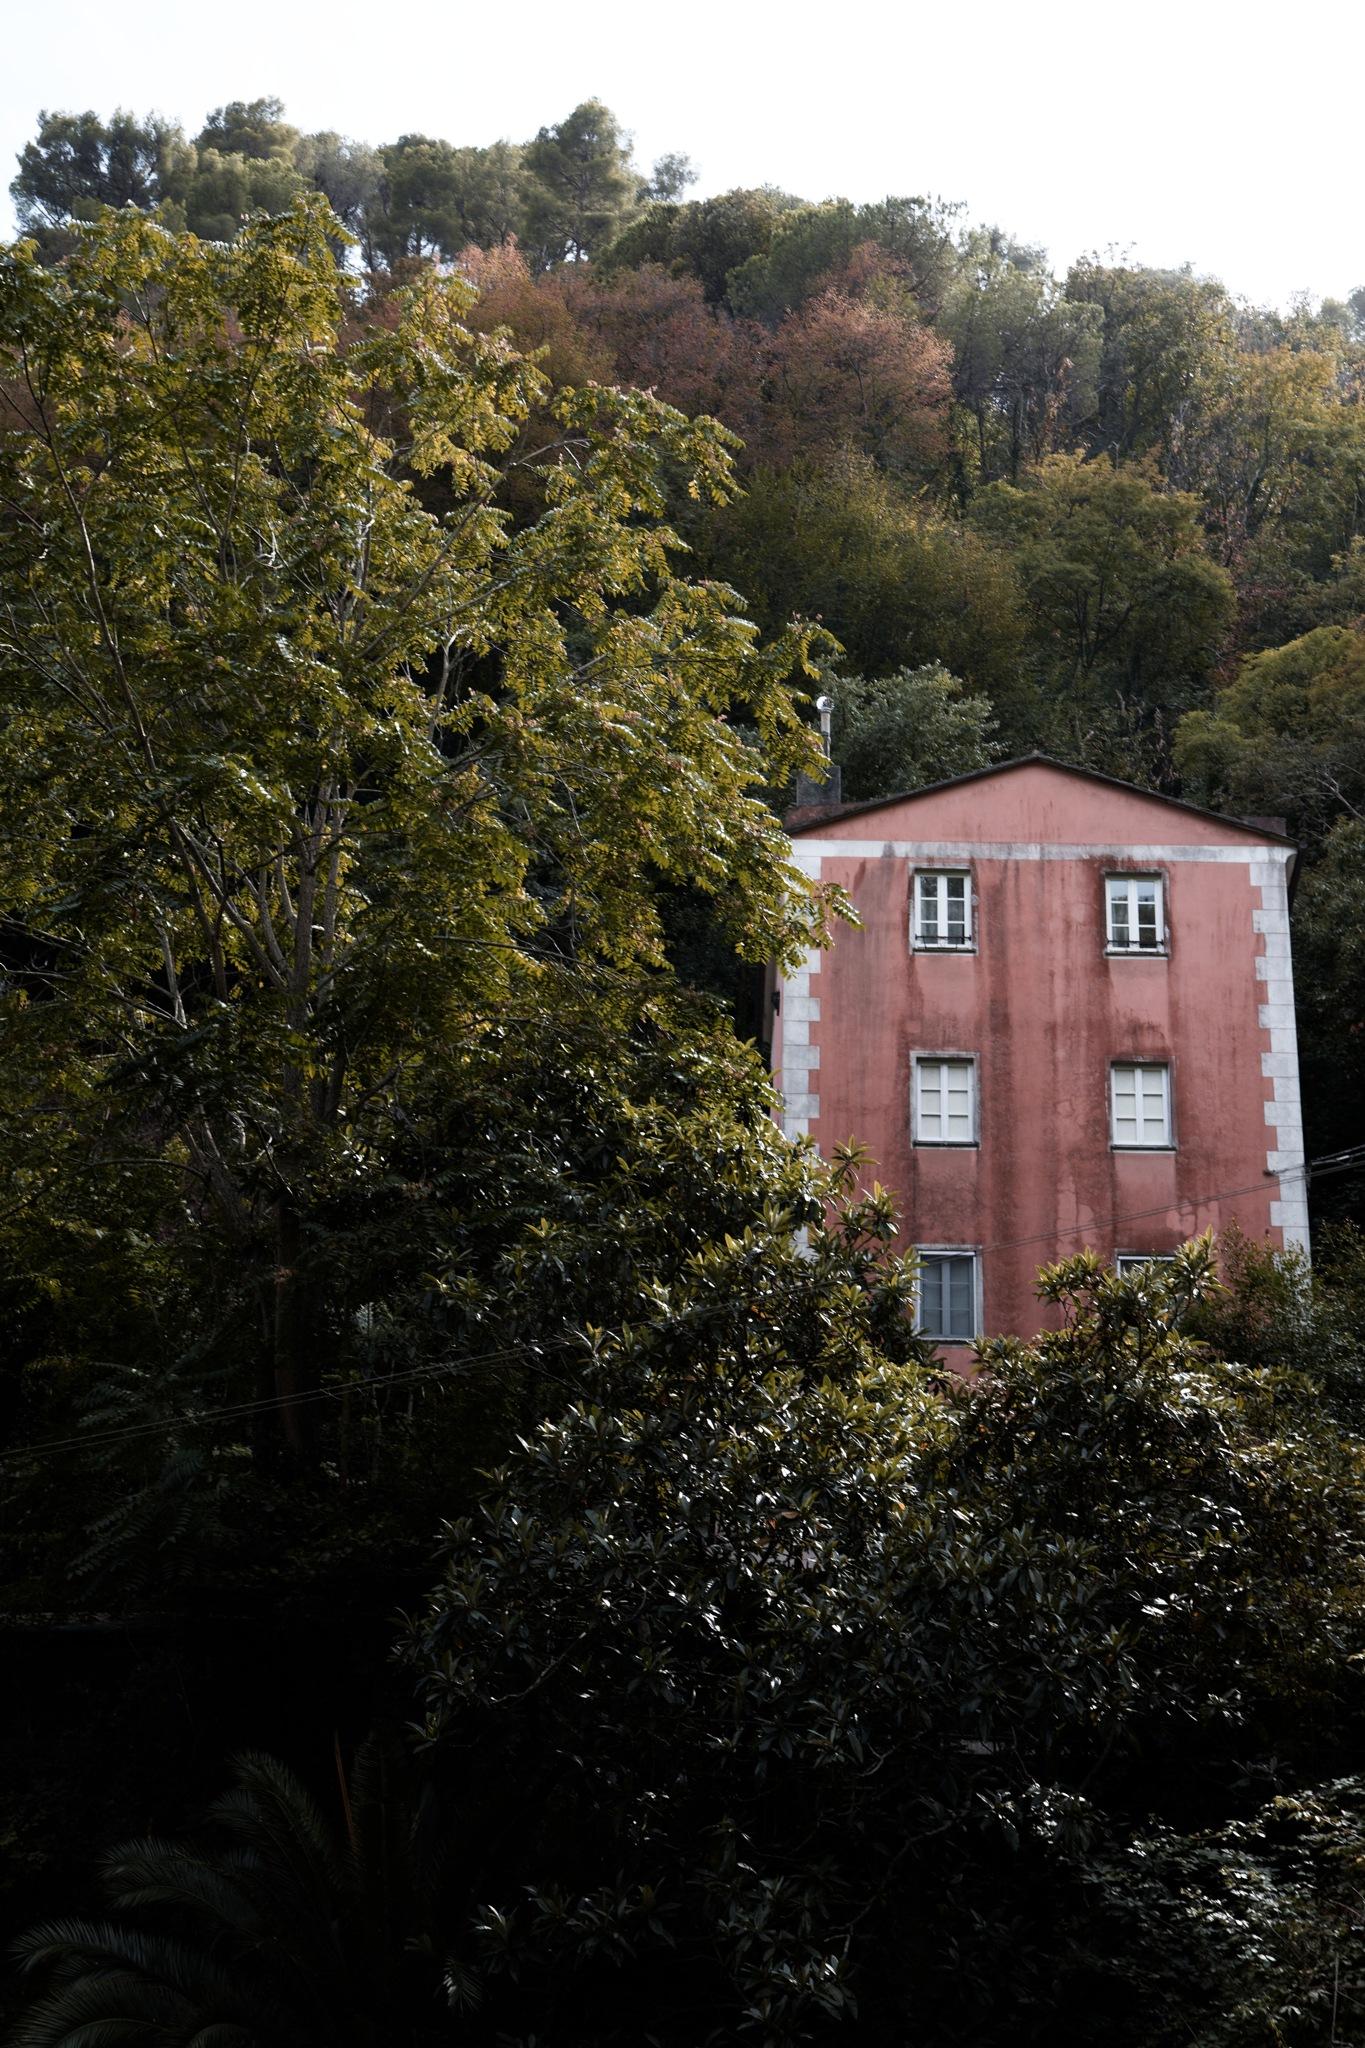 House on the trees by Andrea Zork Abbà